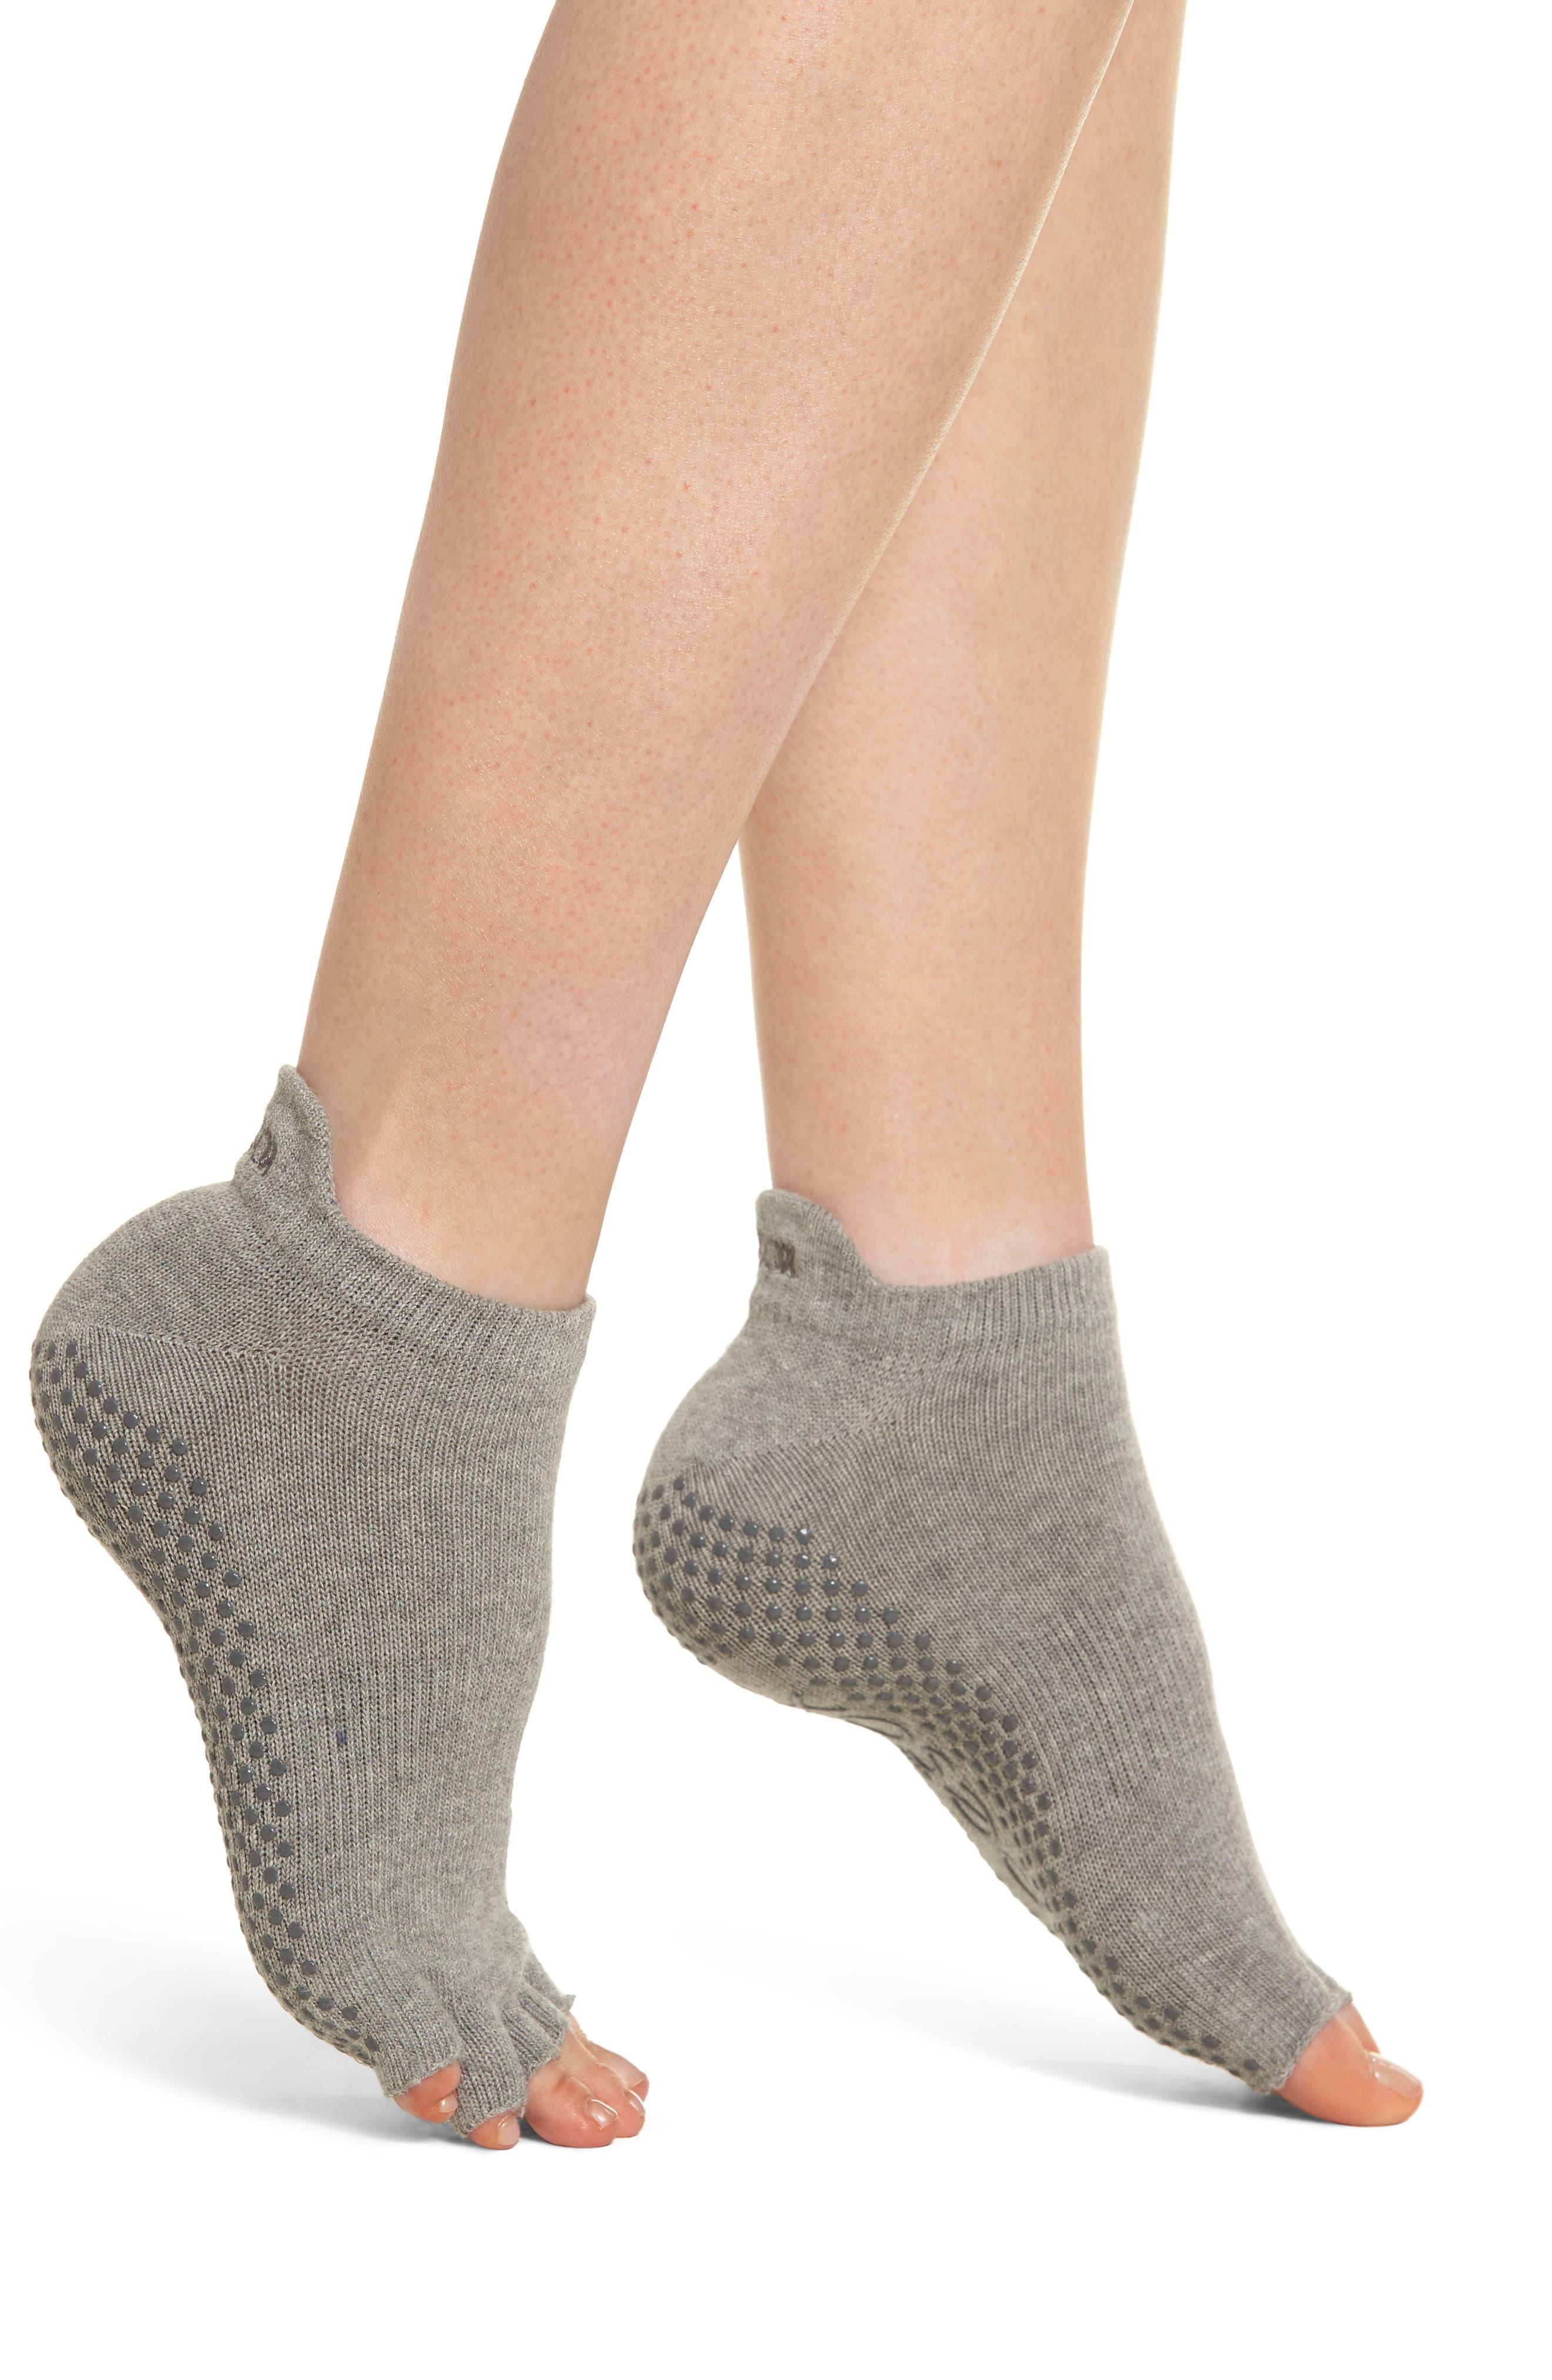 Low Rise Half-Toe Gripper Socks,                             Main thumbnail 1, color,                             050